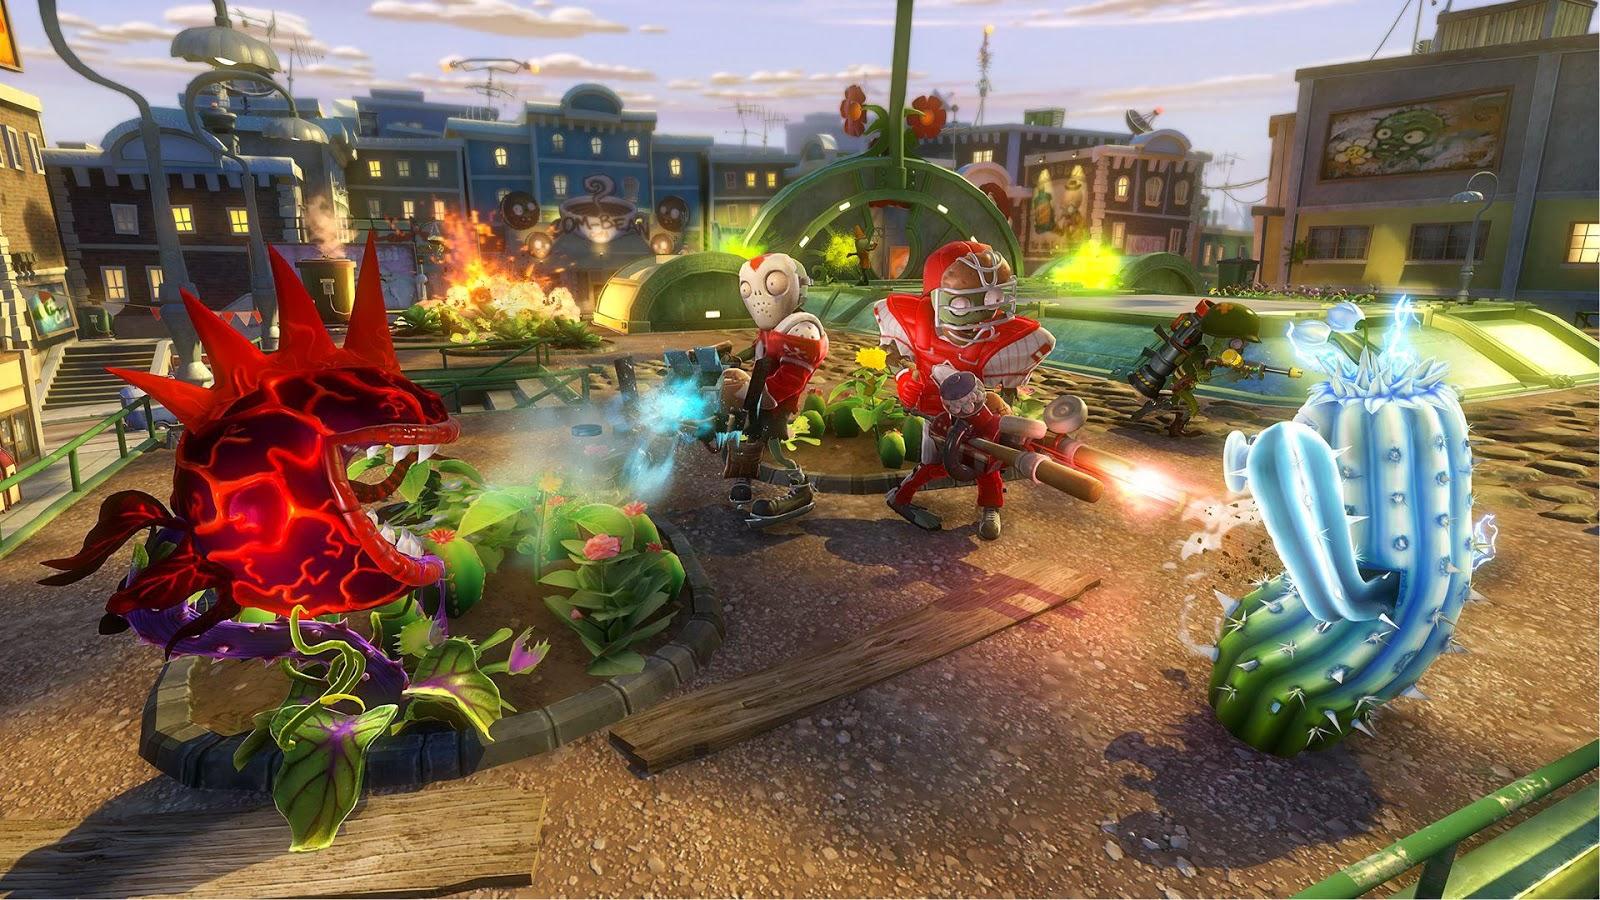 Pvzgardenwarfarepcdownload - Plants vs zombies garden warfare for pc ...